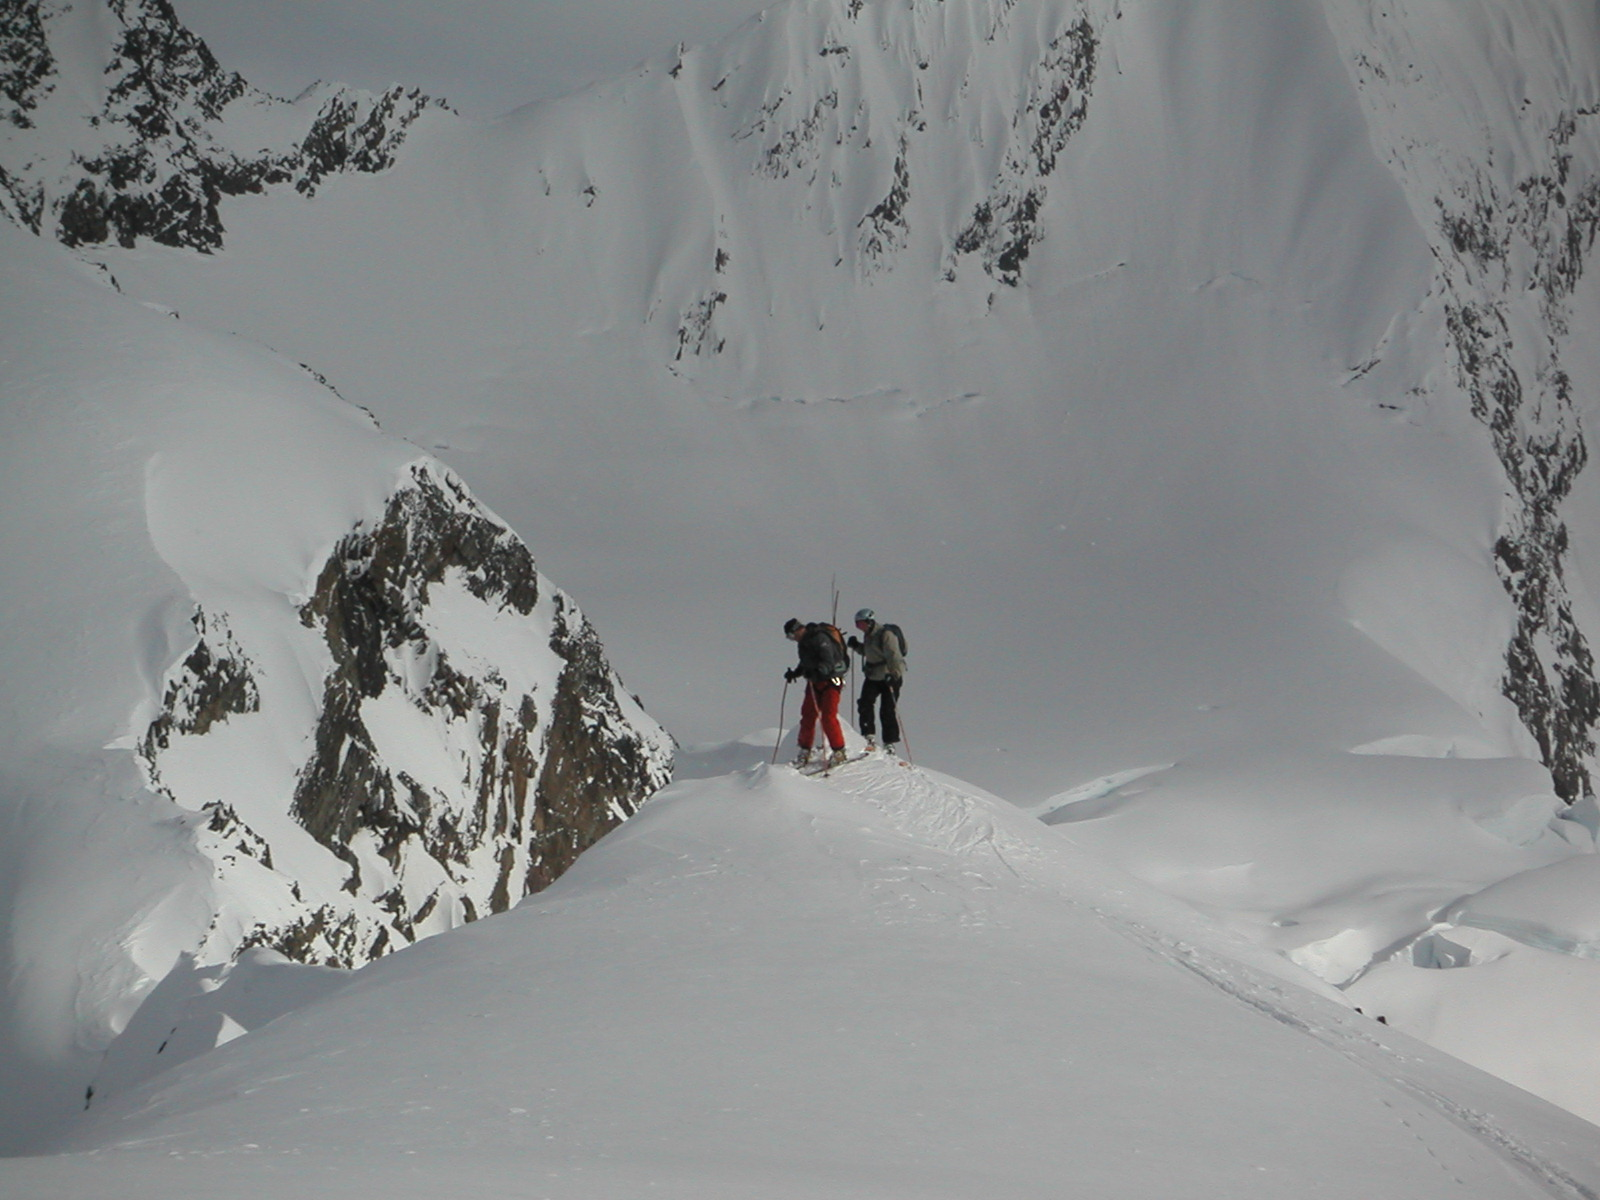 Entry into the Valley of the Tusk, Valdez, Alaska, Alyeska Resort